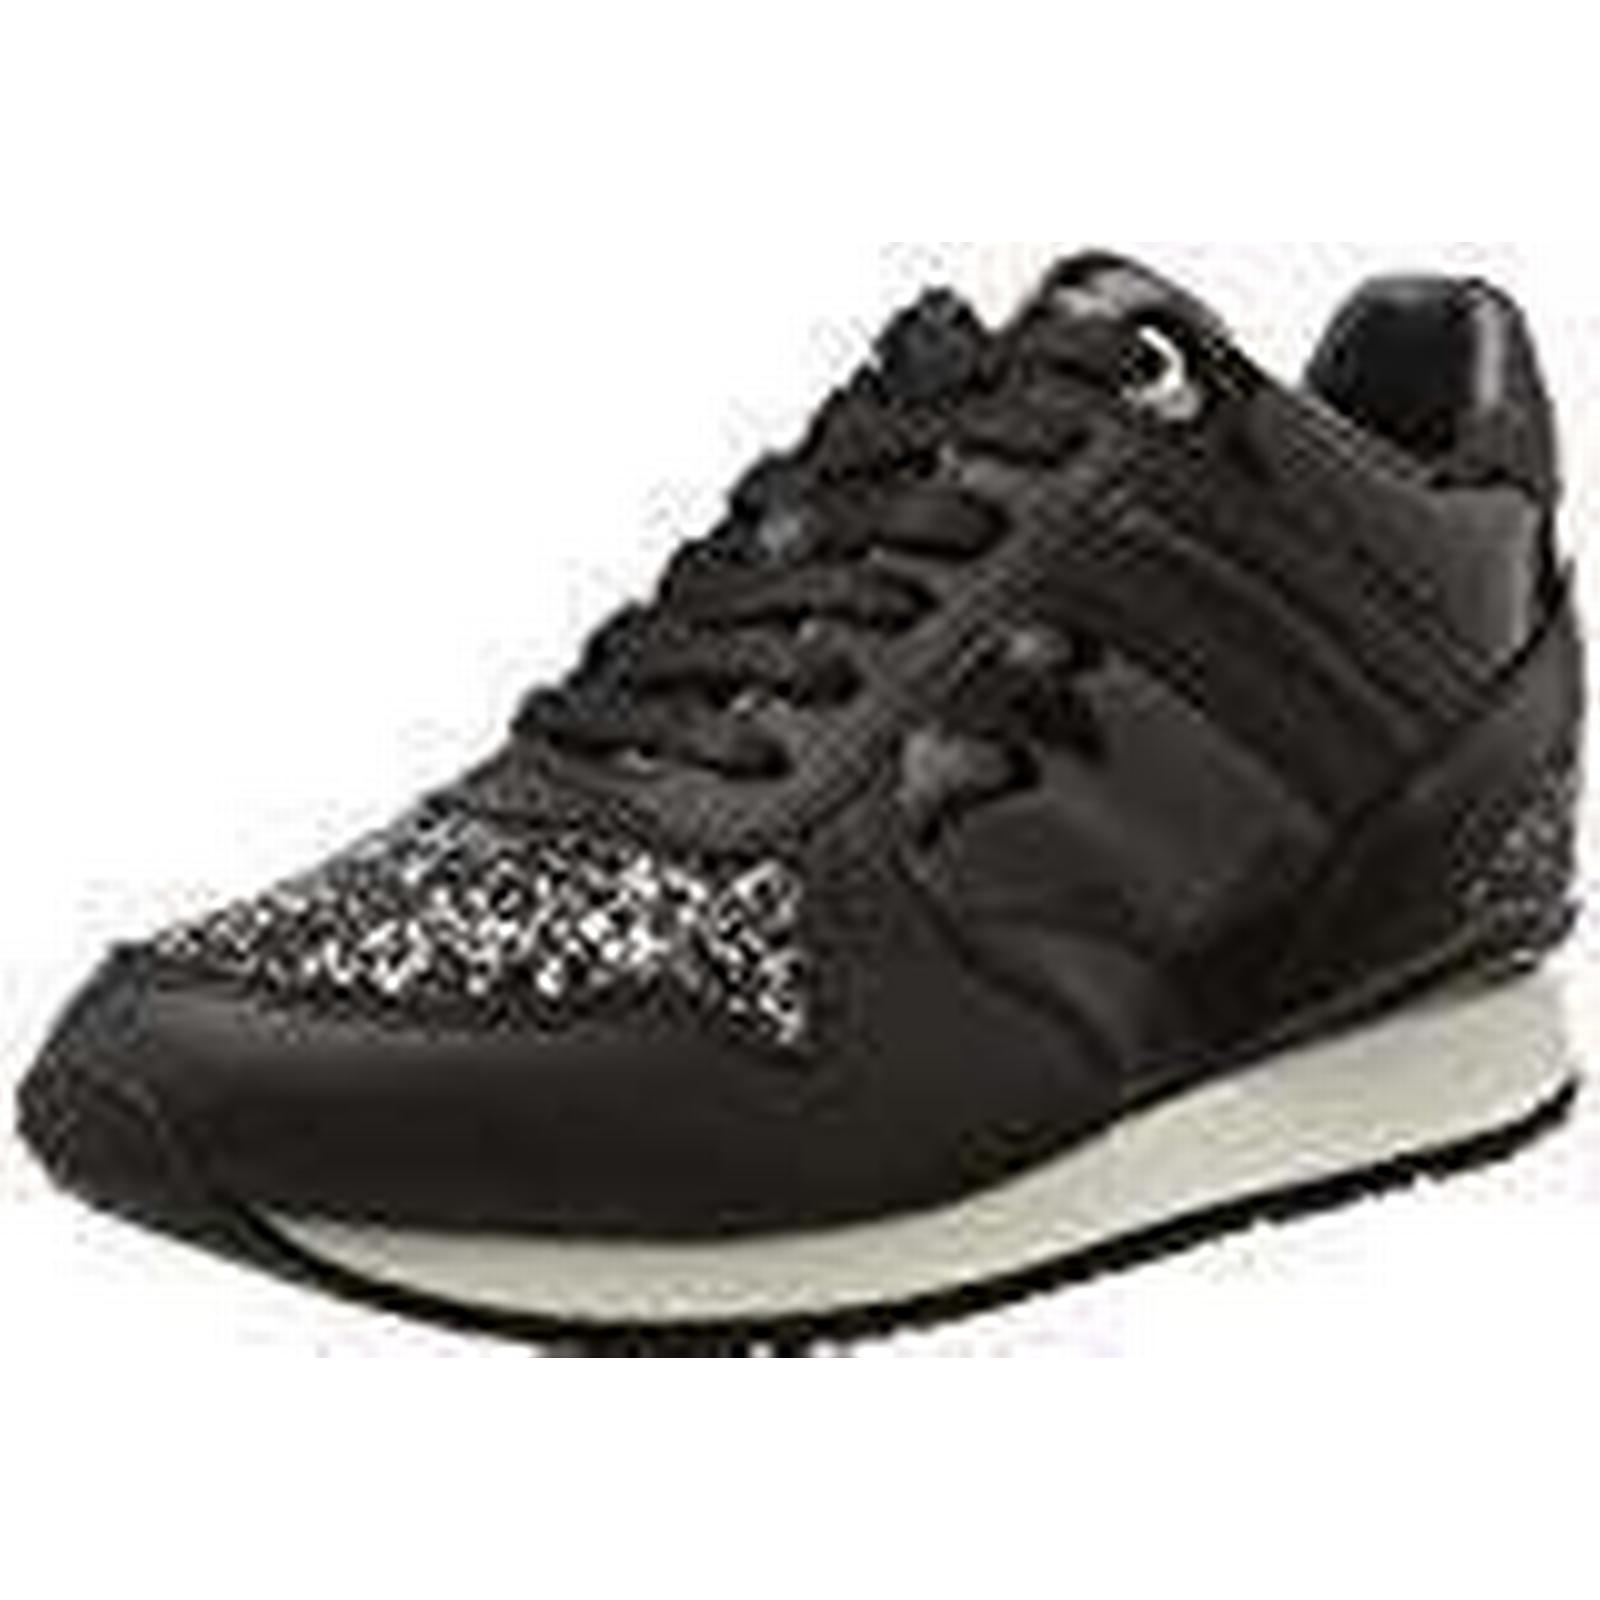 Tommy Hilfiger Women's S1285ady 13c2 UK Low-Top Sneakers, Black, 6.5 UK 13c2 135120